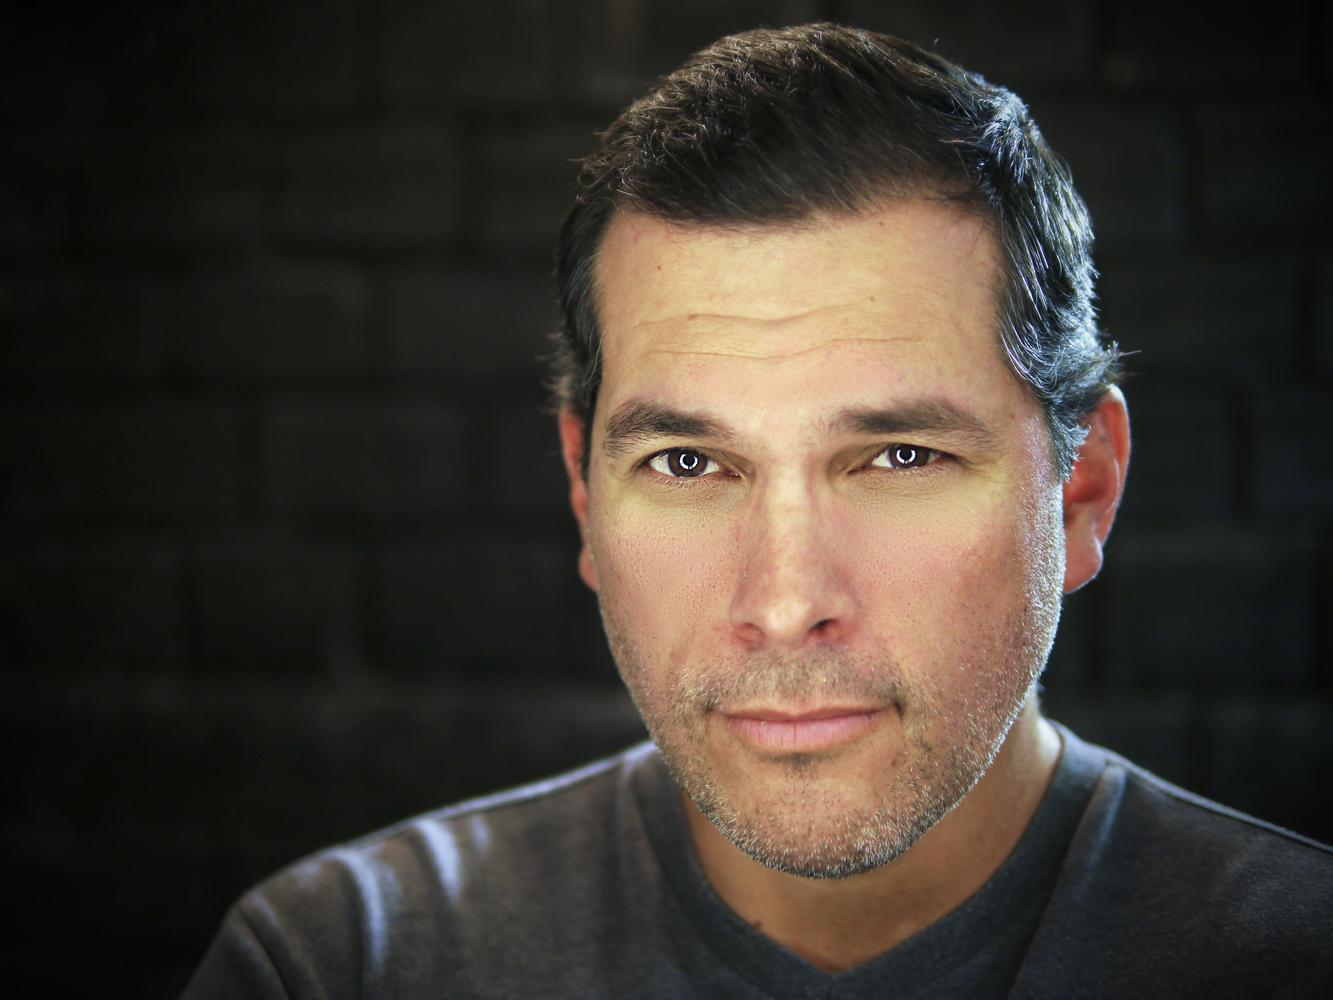 Headshot (actor) by Erik Tande